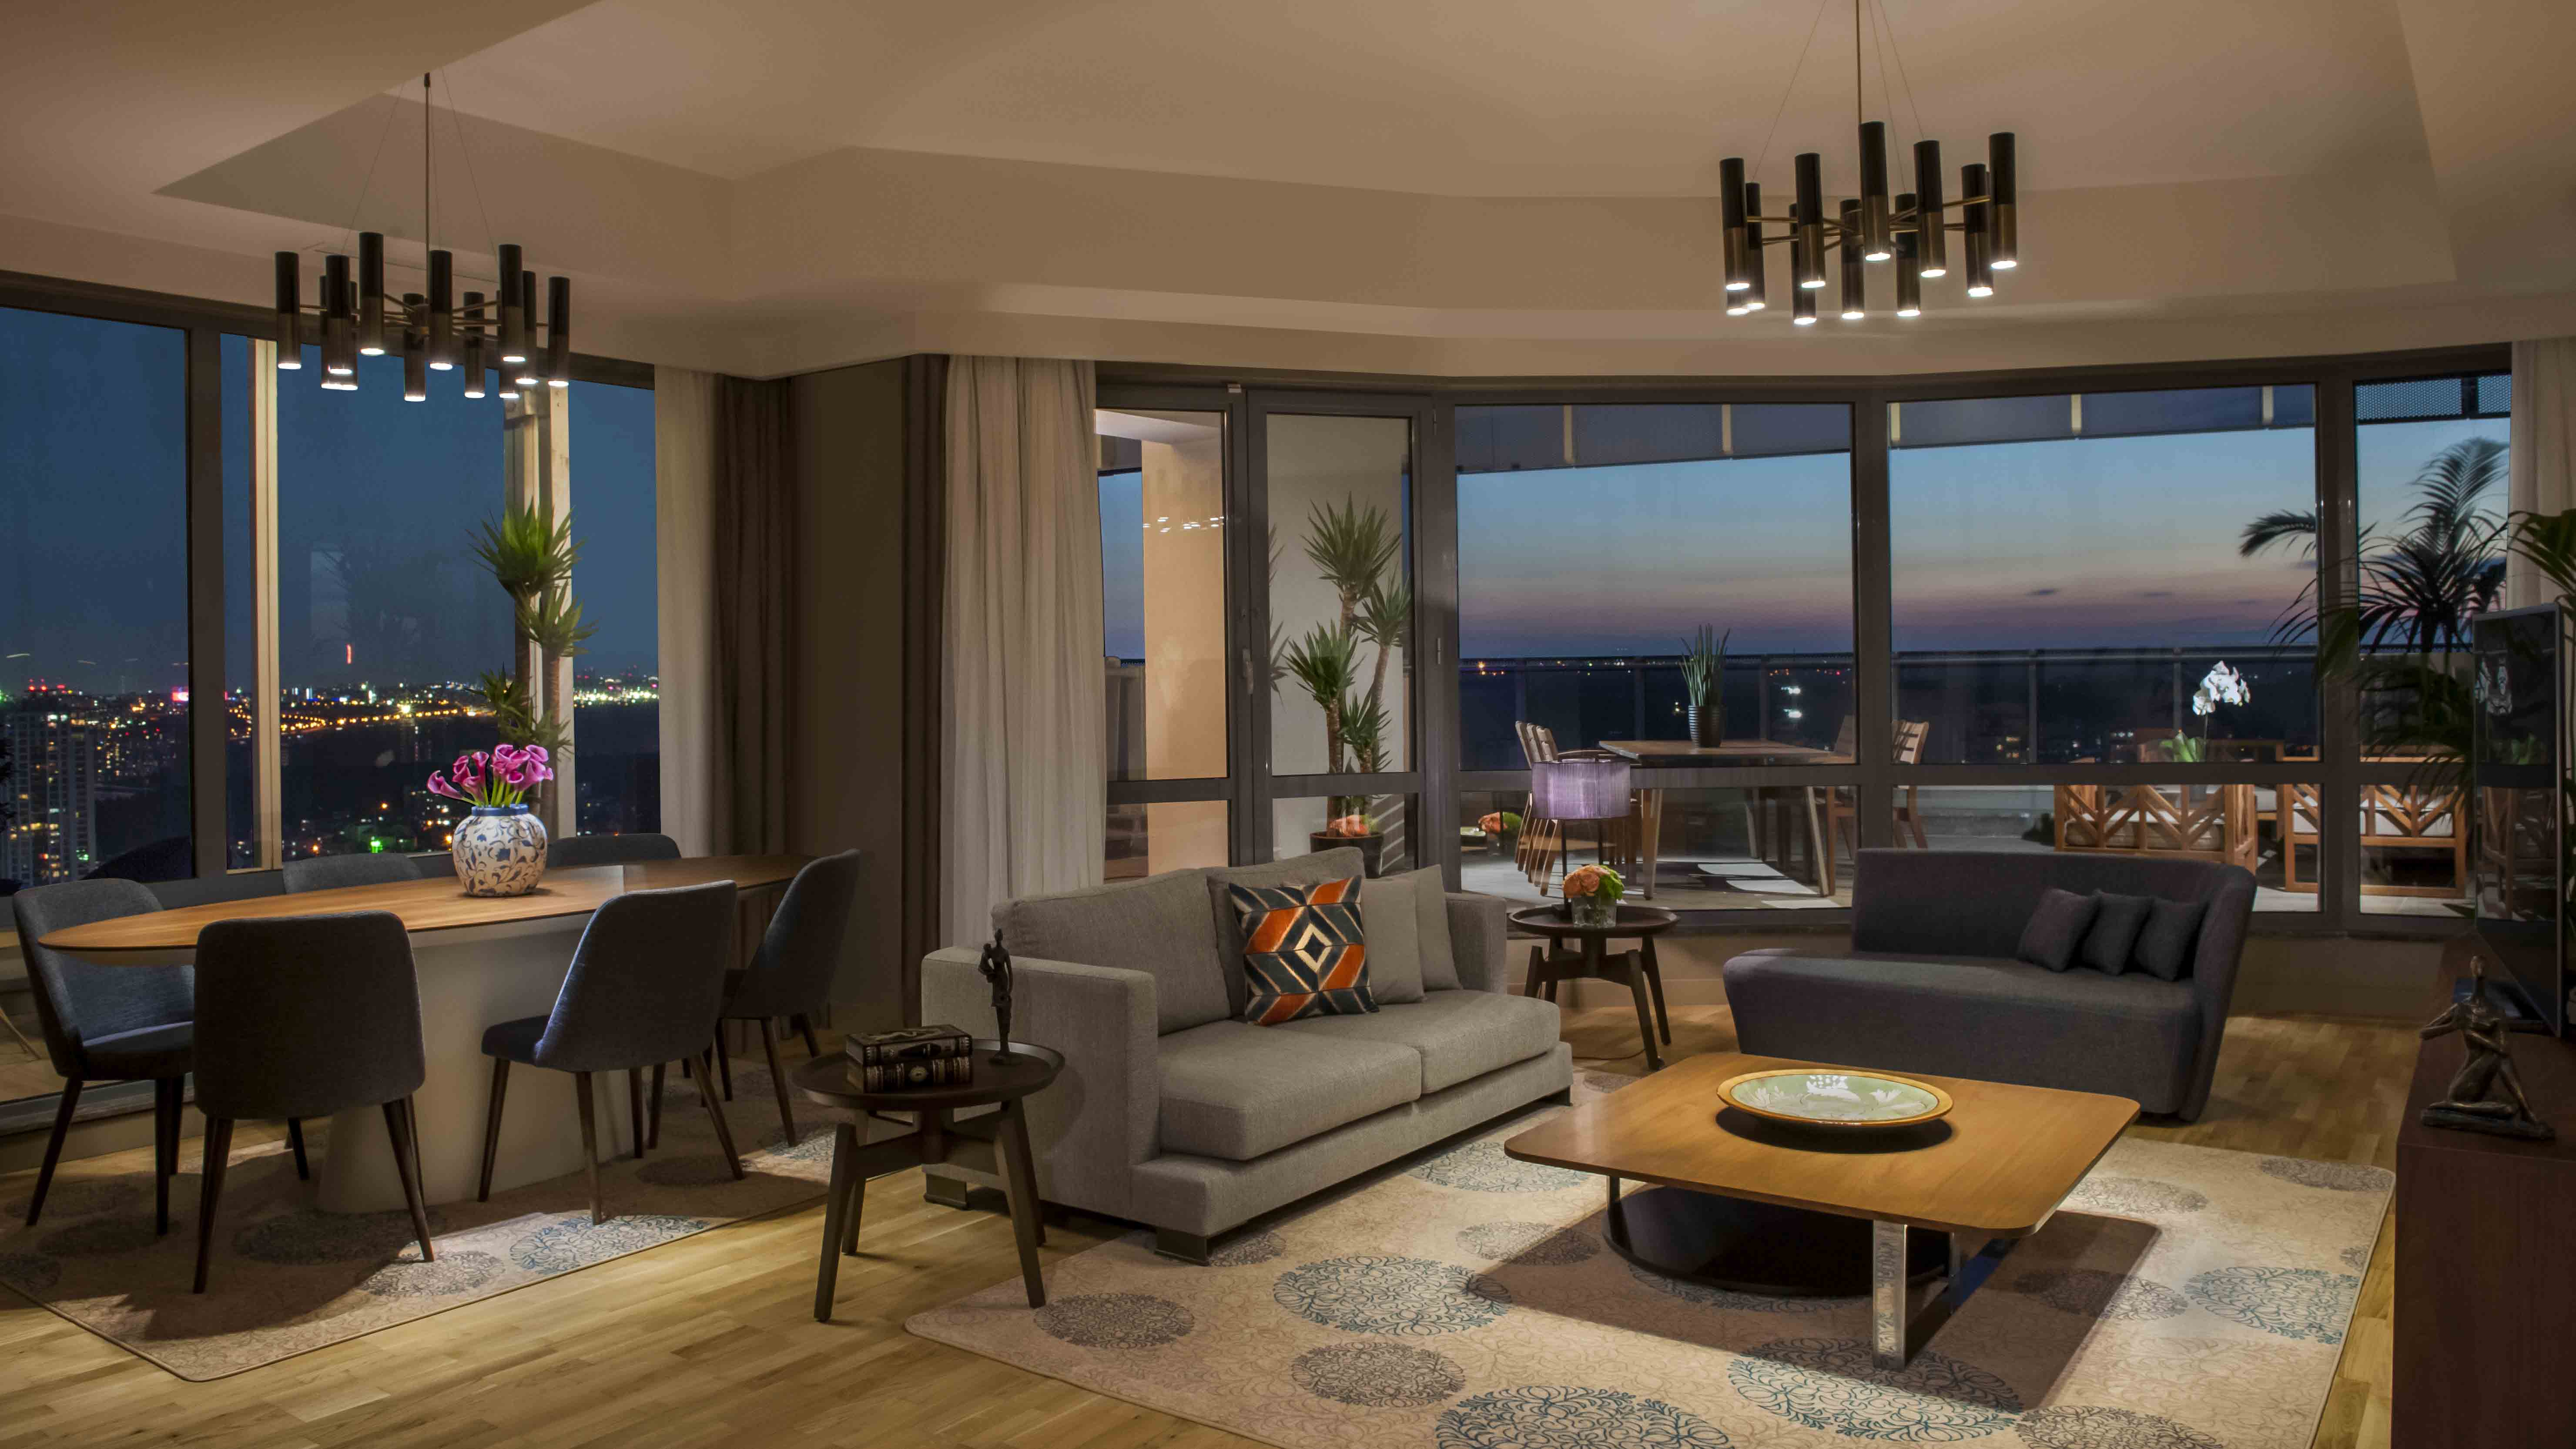 Apartment View of Maslak Konaklama in Istanbul - Mace Group